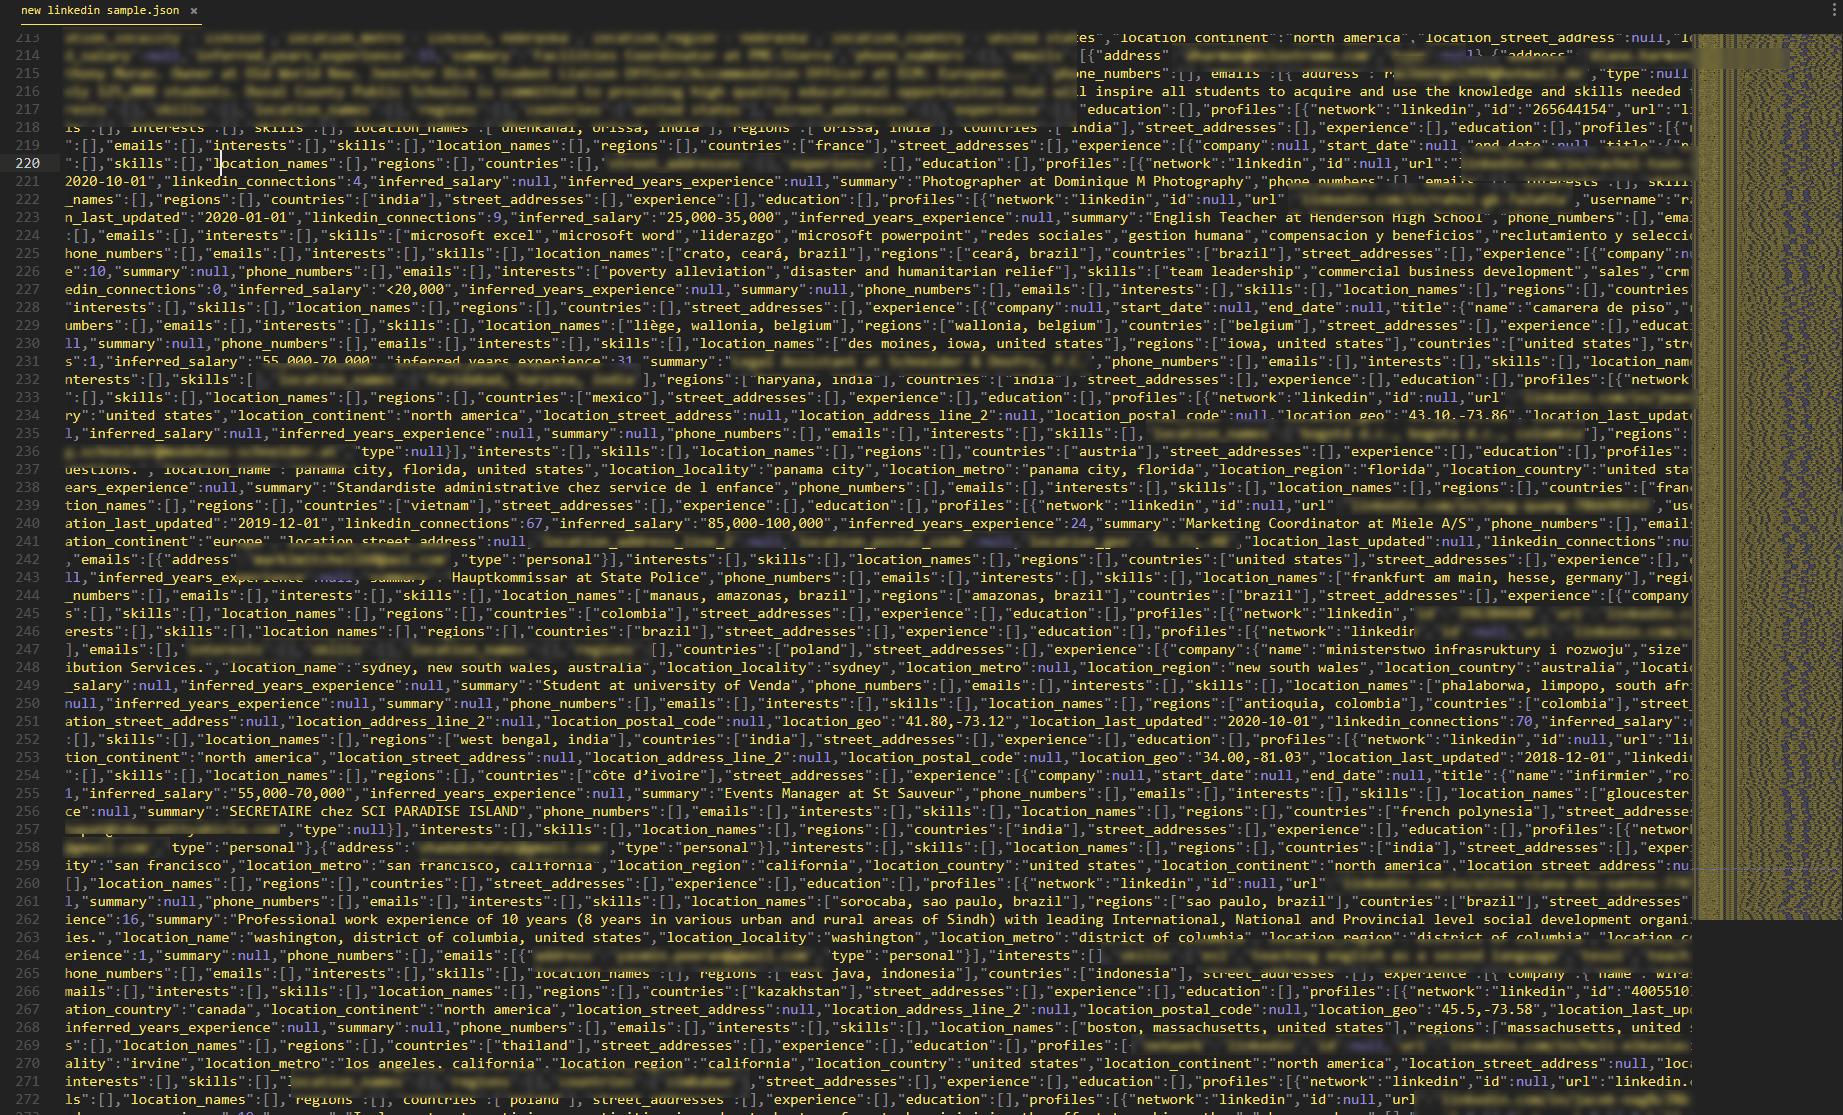 linkedin raw data